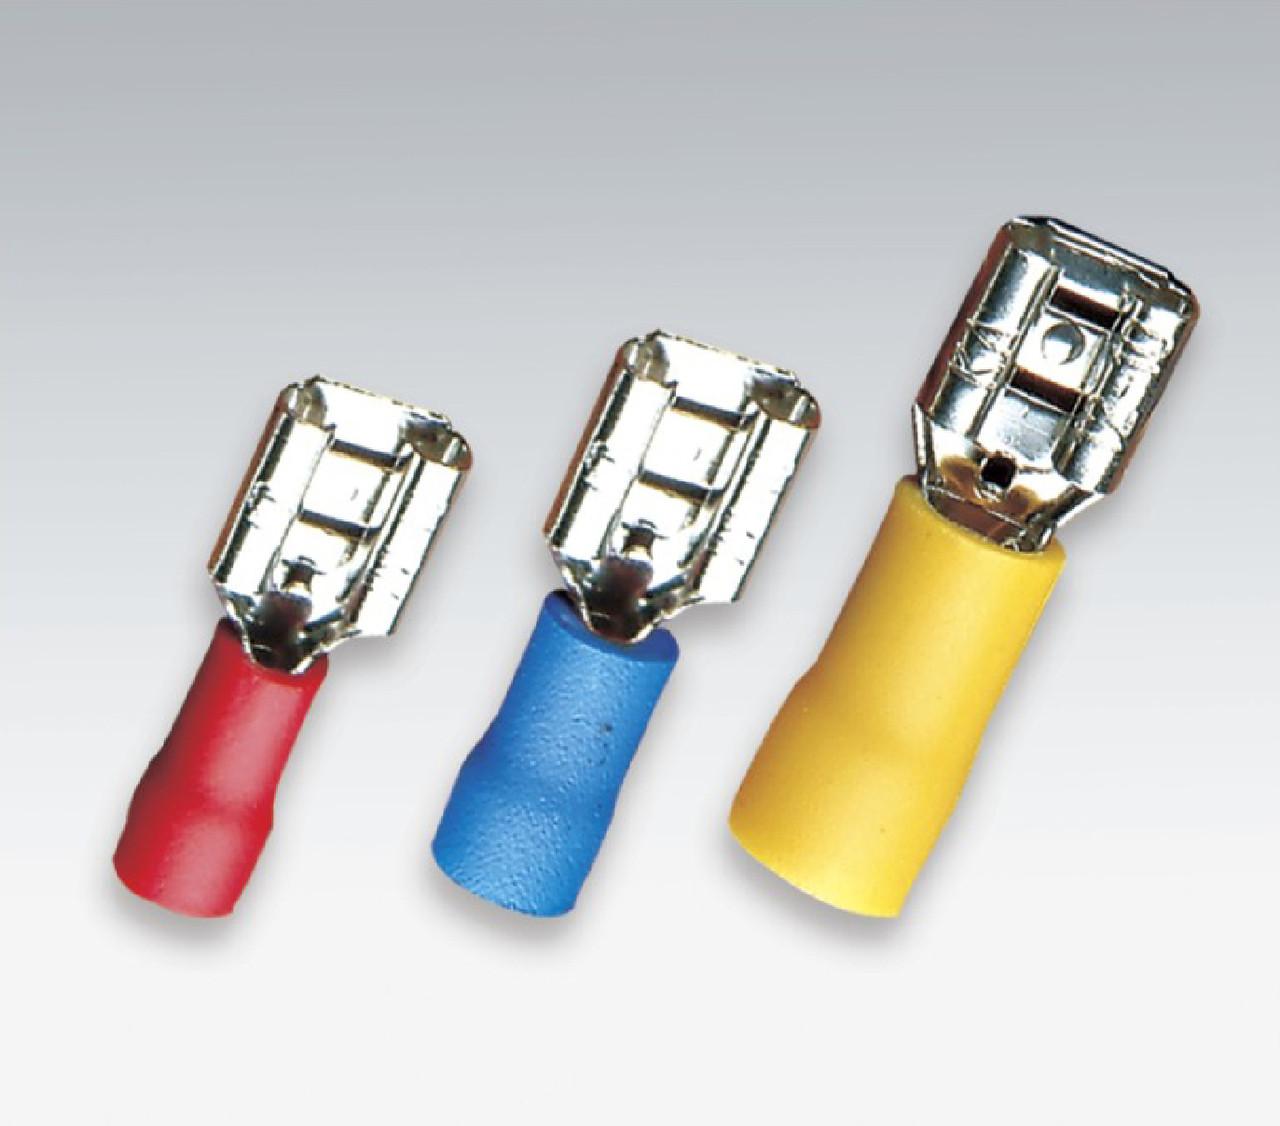 Конектор плоский плон. изол. FDFN 2-250 1,5-2,5/6,3-0,8 (100шт)